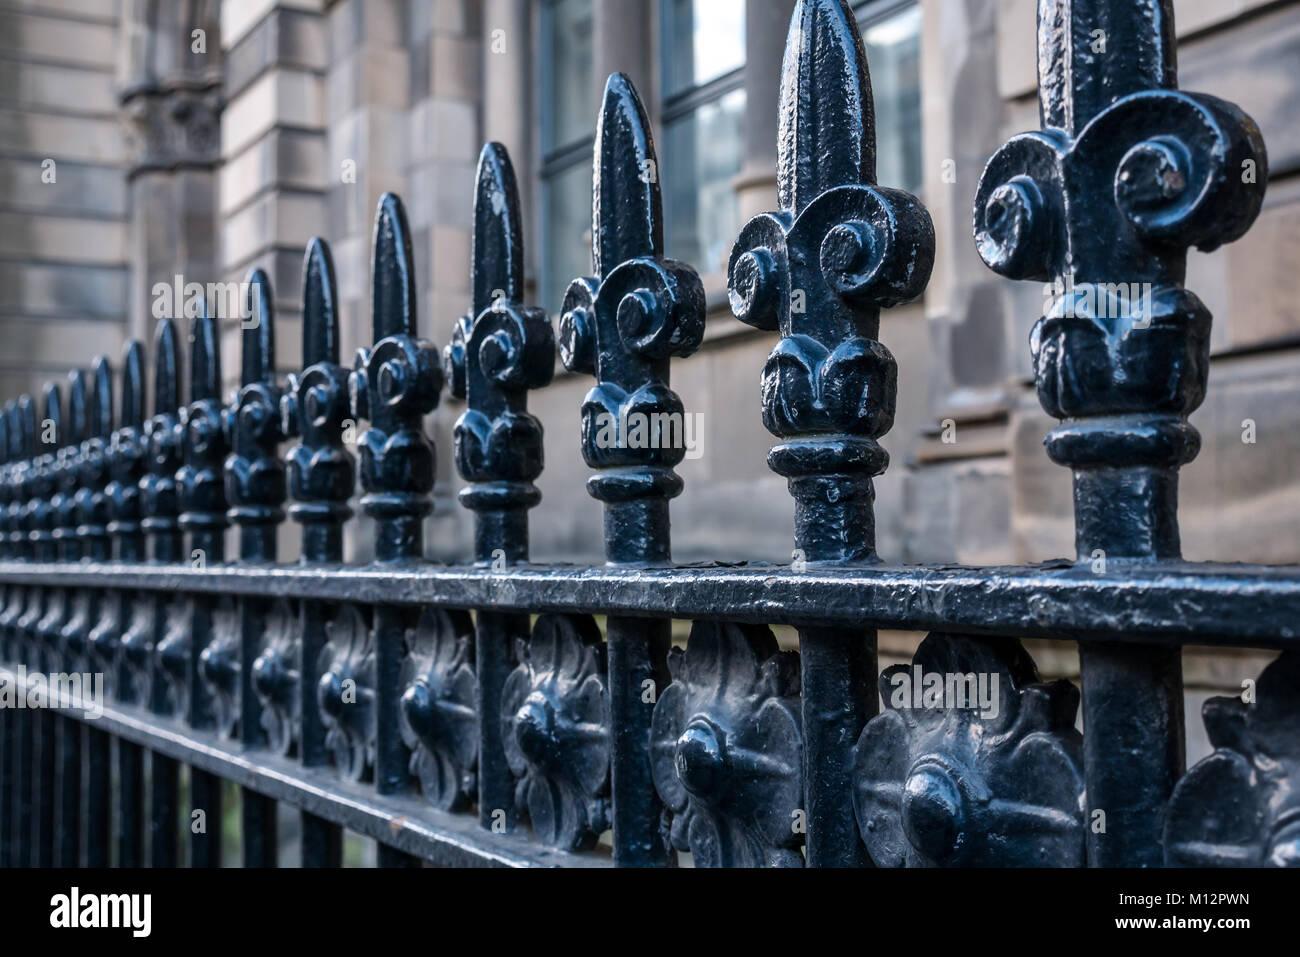 Close up of Victorian black cast iron railings with fleur de lys pattern, Chambers Street, Edinburgh, Scotland, - Stock Image